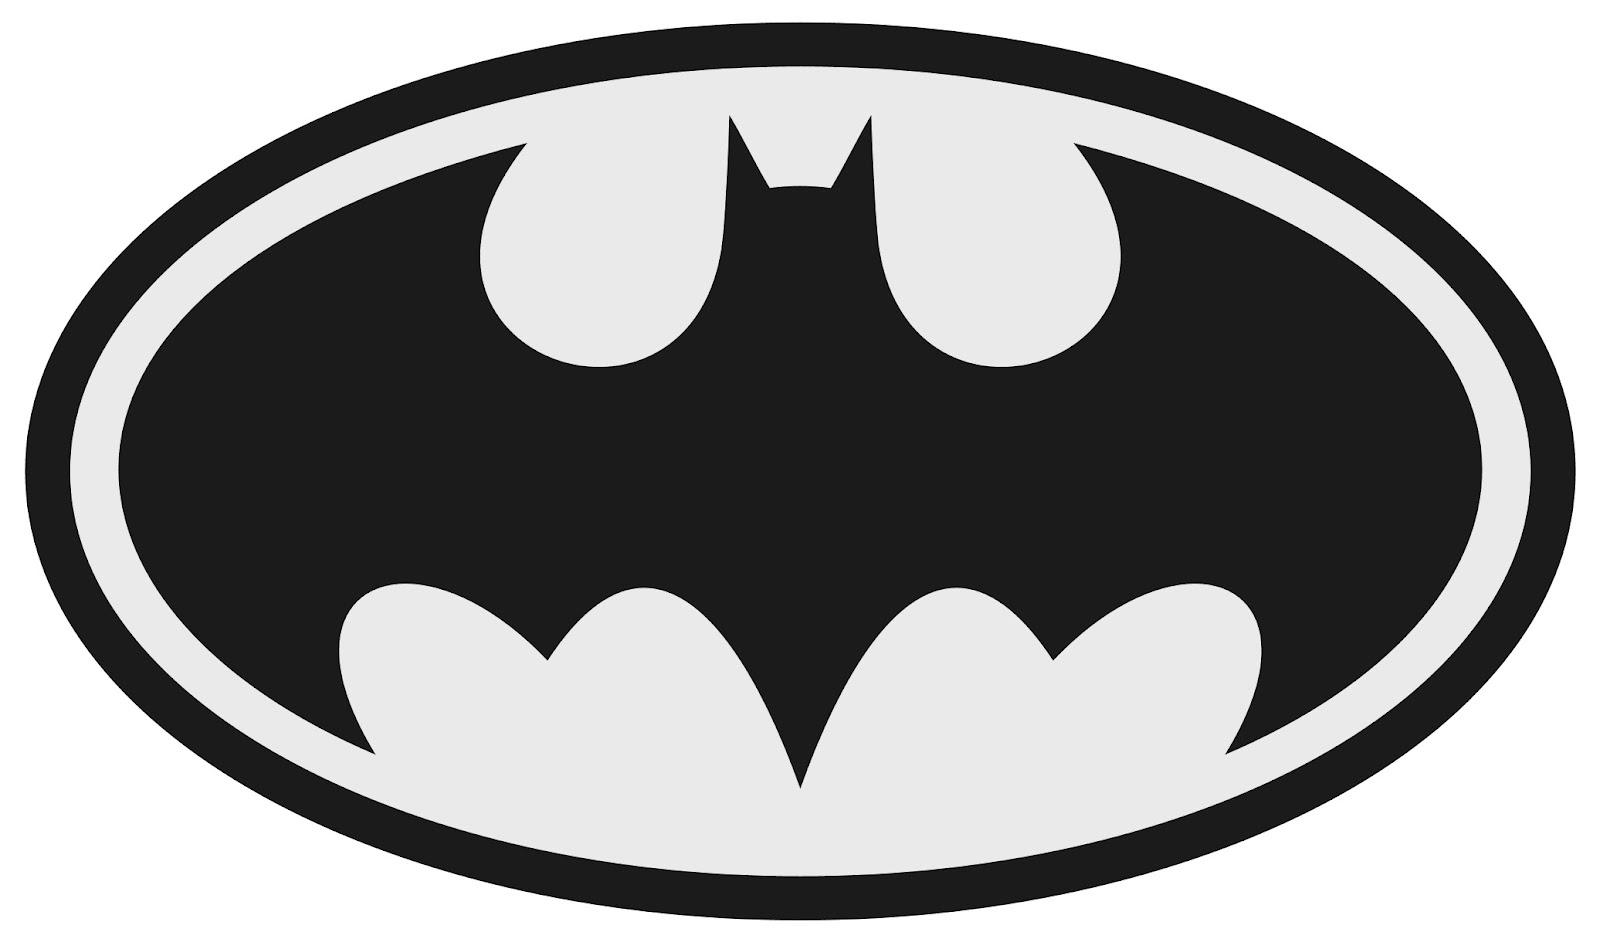 Spiderman clipart emblem And logo 7 black BBCpersian7